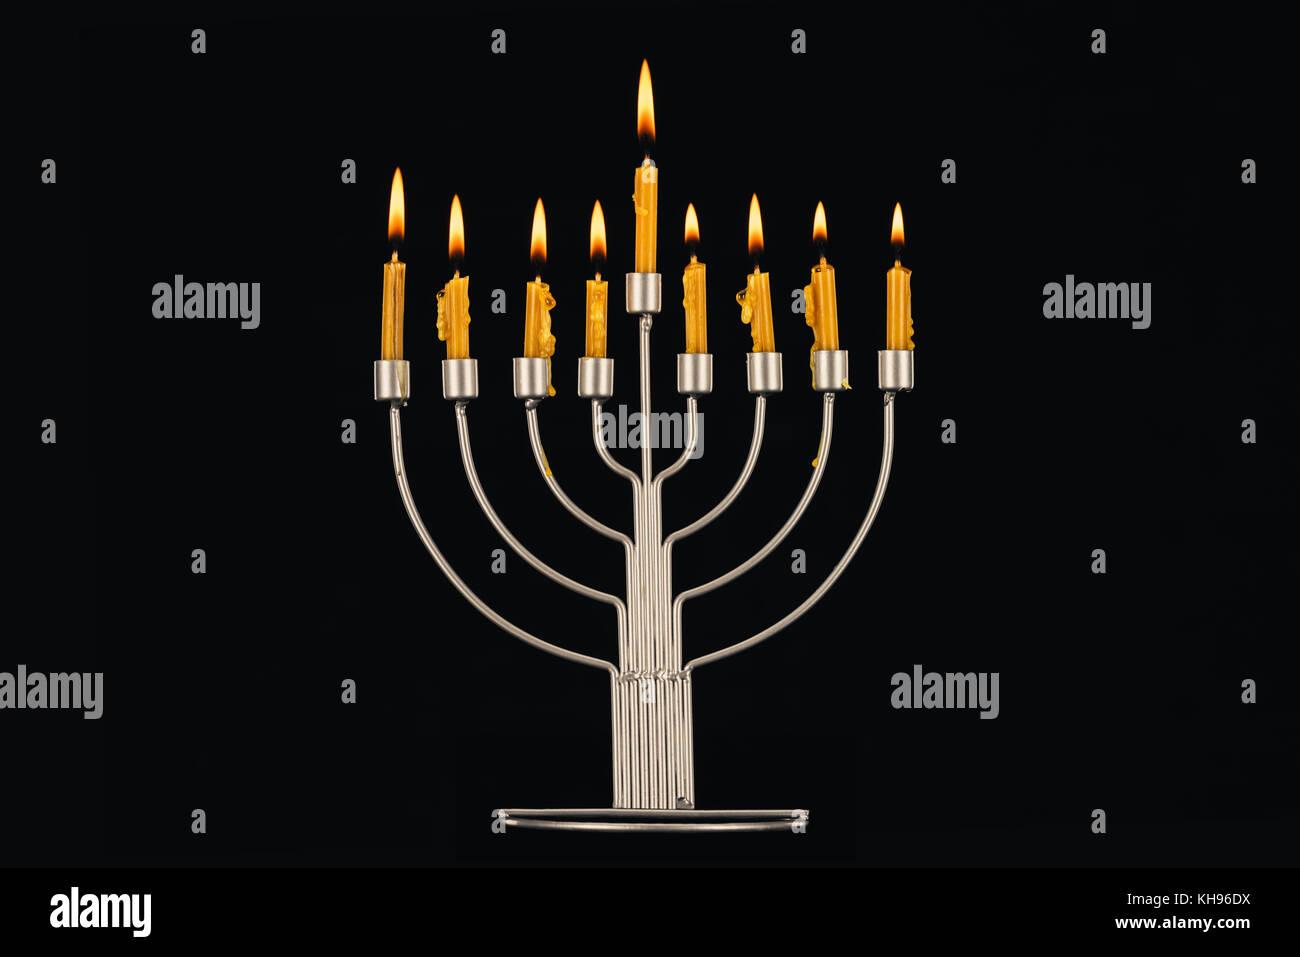 hanukkah celebration with menorah and candles - Stock Image